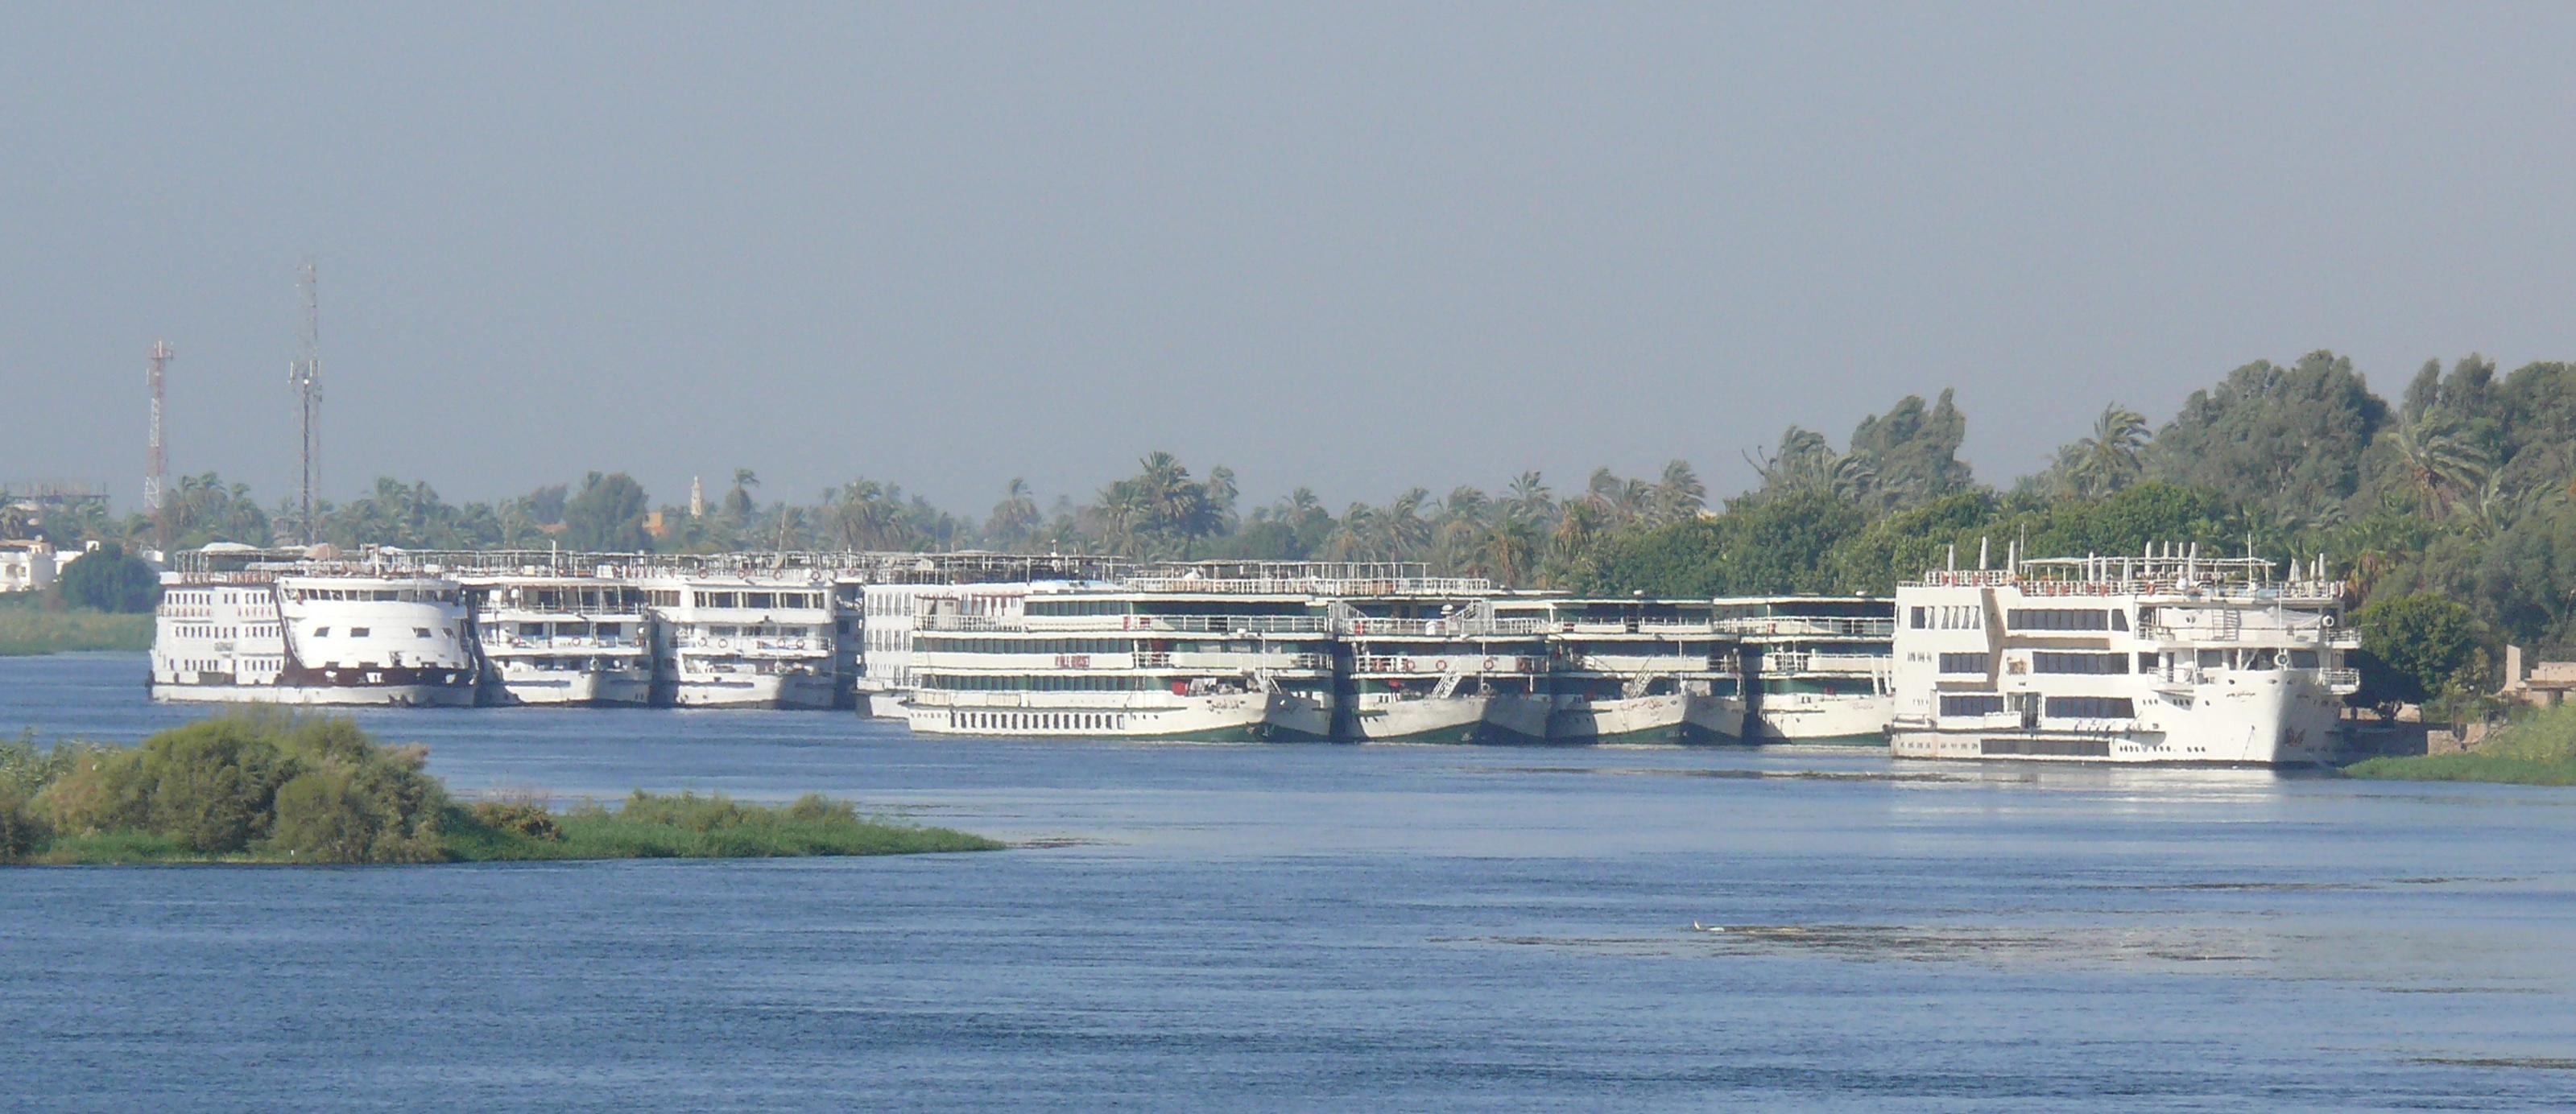 River Nile Cruise Ships Images